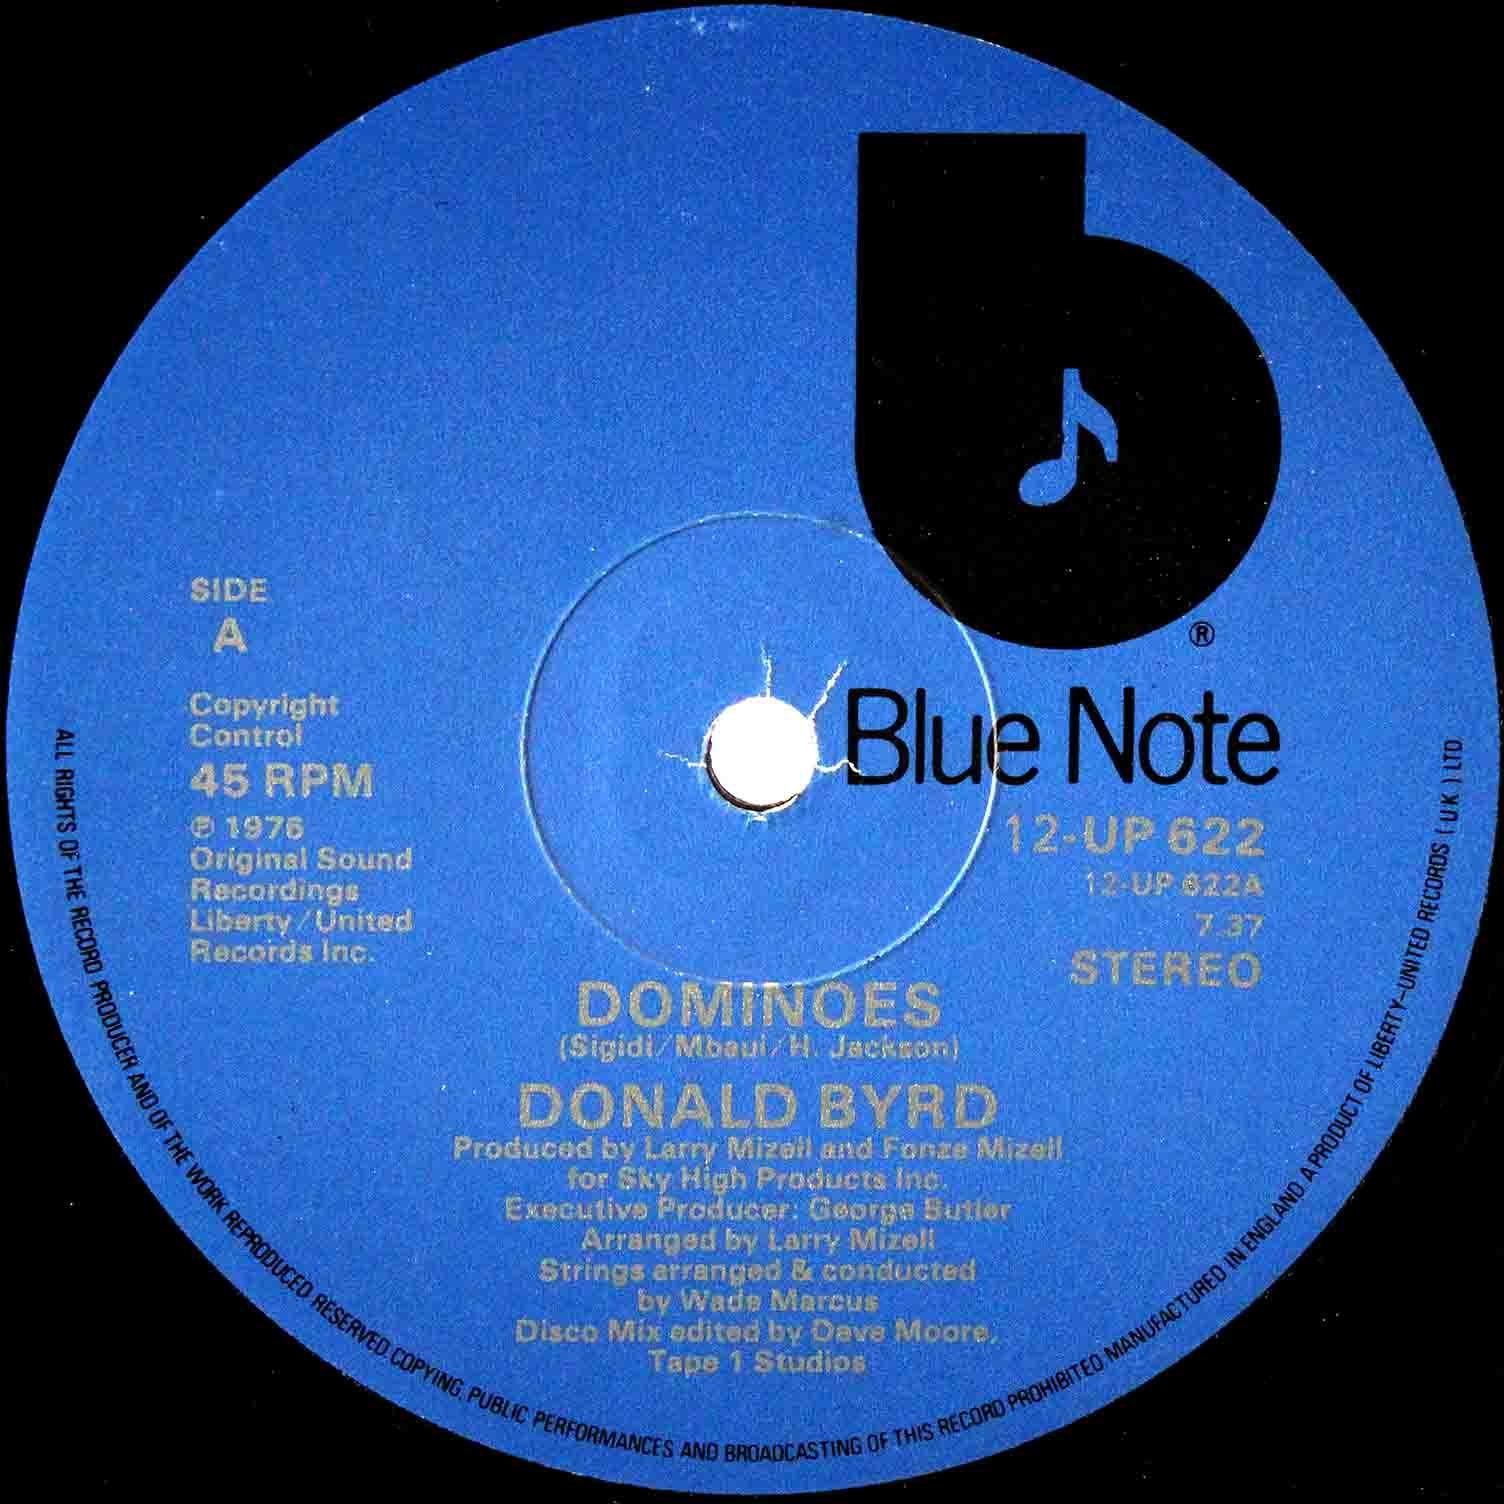 Donald Byrd Dominoes UK 02